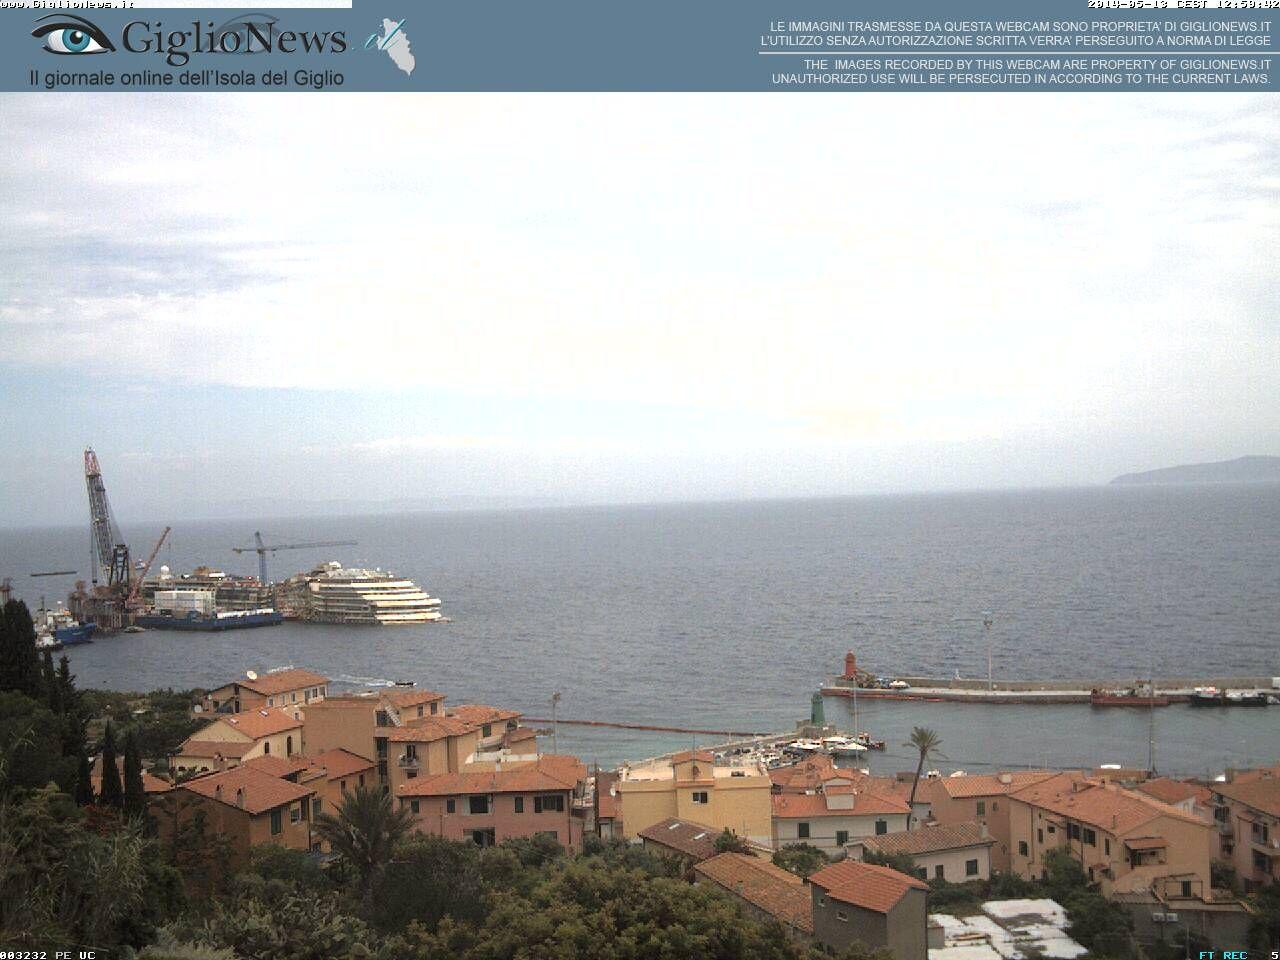 Salvage of the Costa Concordia  2014-05-13